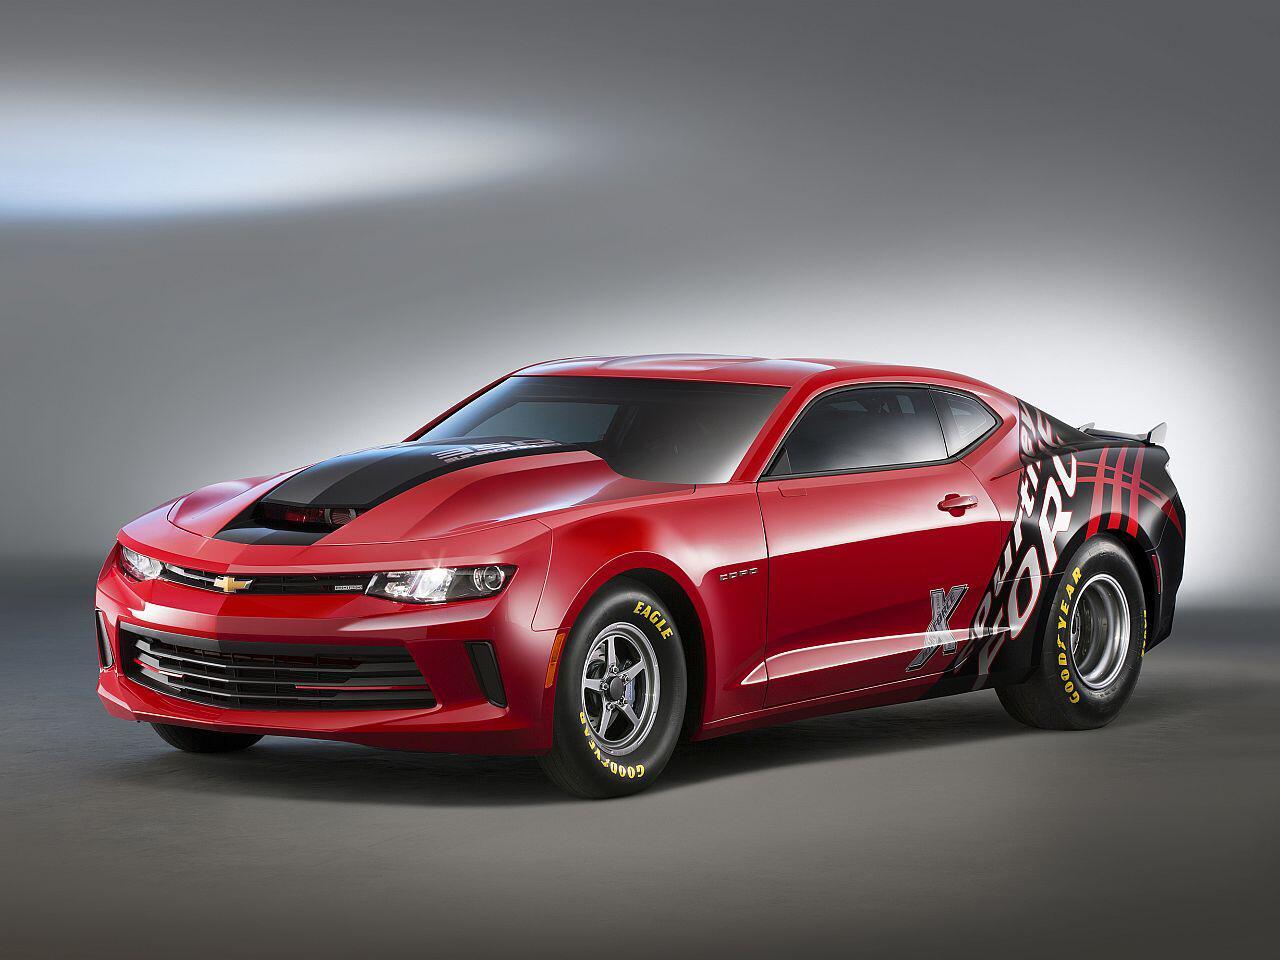 Bild zu Chevrolet COPO Camaro